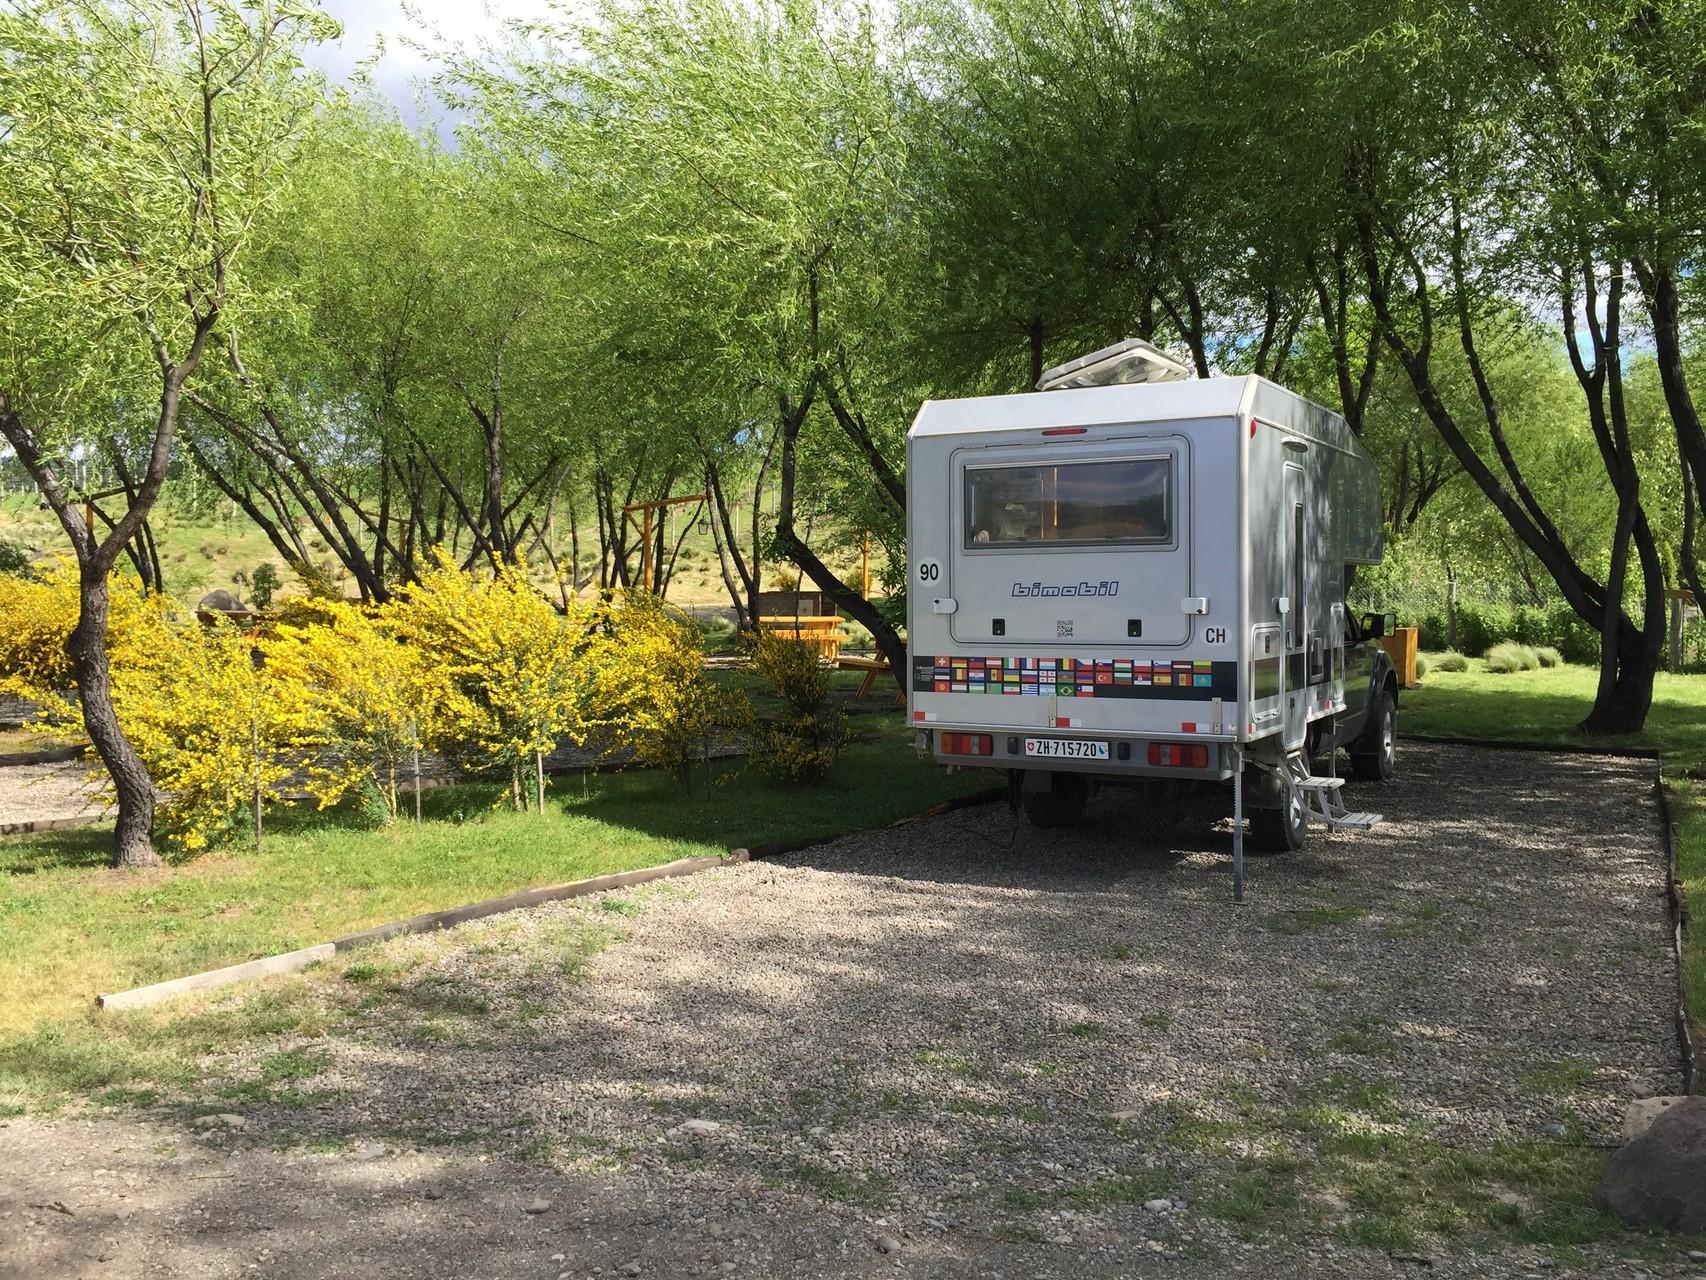 Camping Trevellin, ein Traum